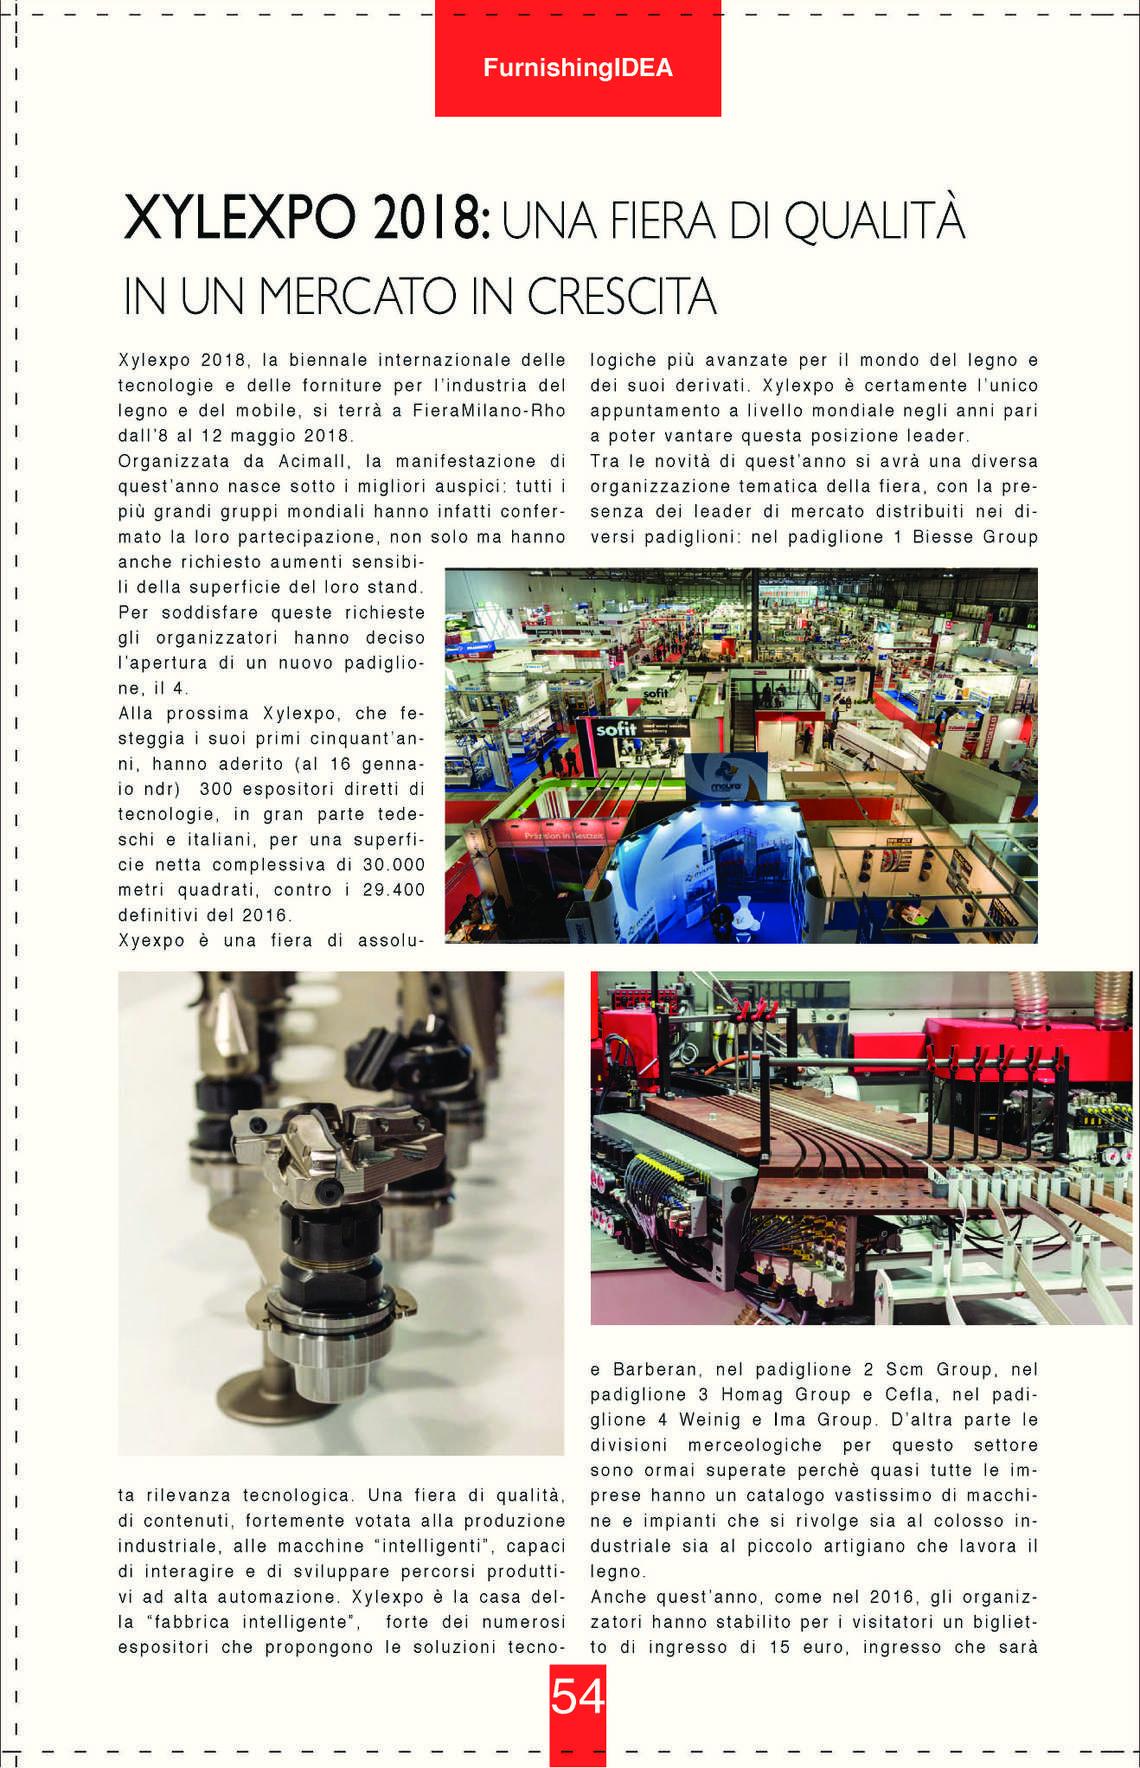 furnishing-idea-journal--1-2018_journal_9_053.jpg